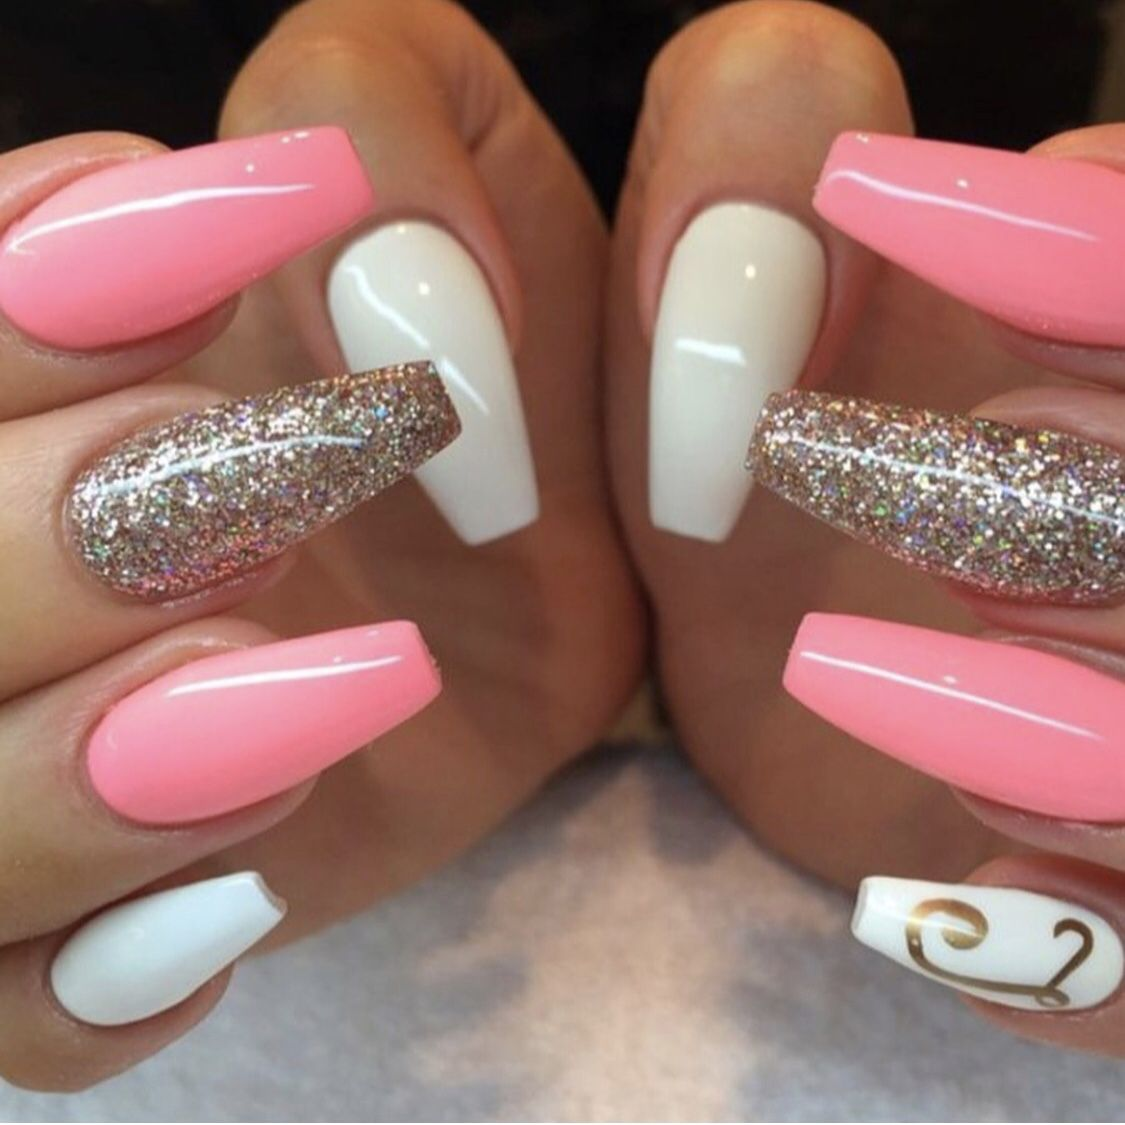 Acrylic Nails Pink Acrylic Nails Glitter Nails Acrylic Acrylic Nails Coffin